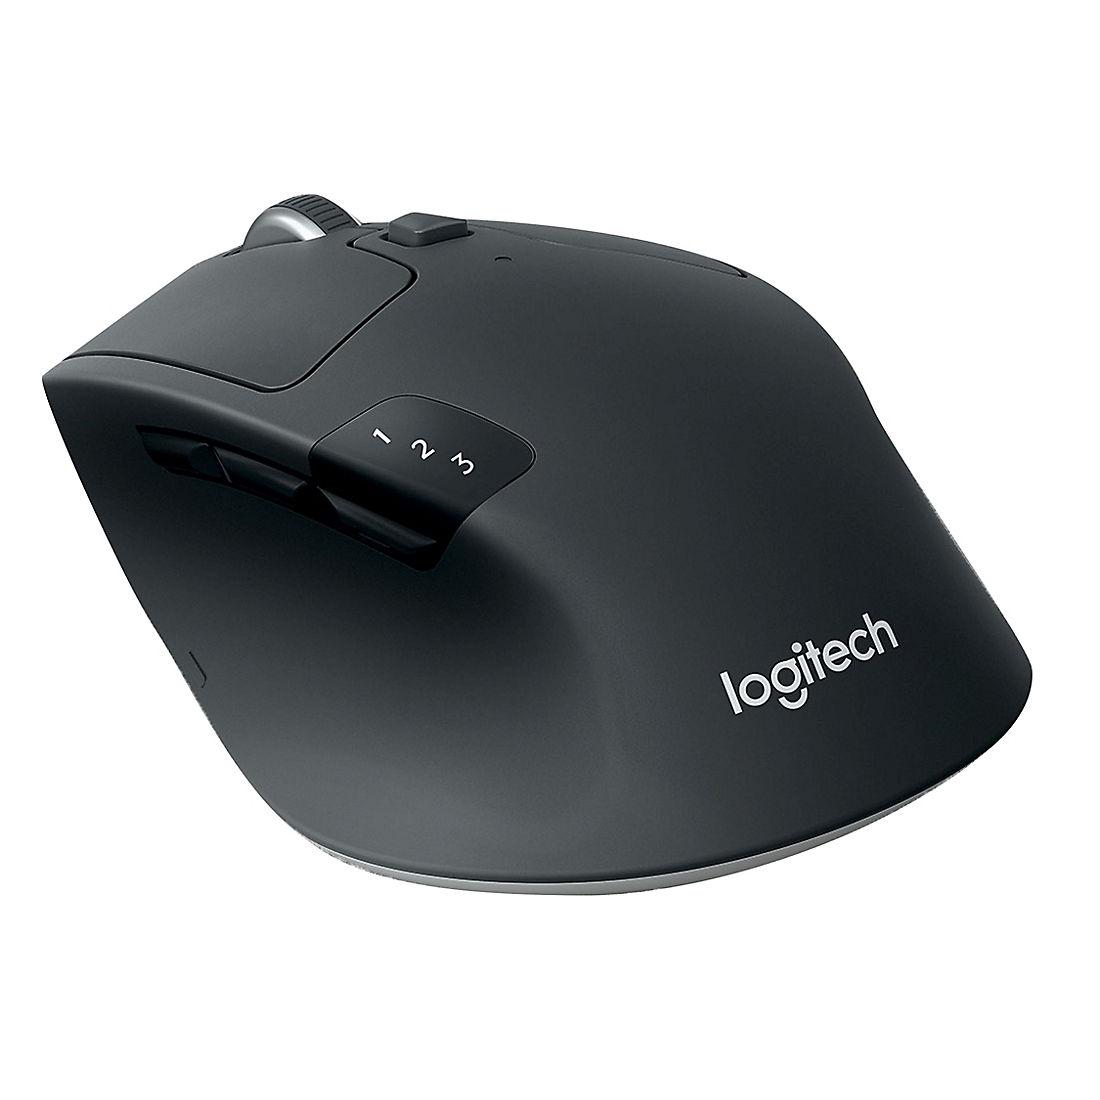 Logitech Wireless Pro Mouse